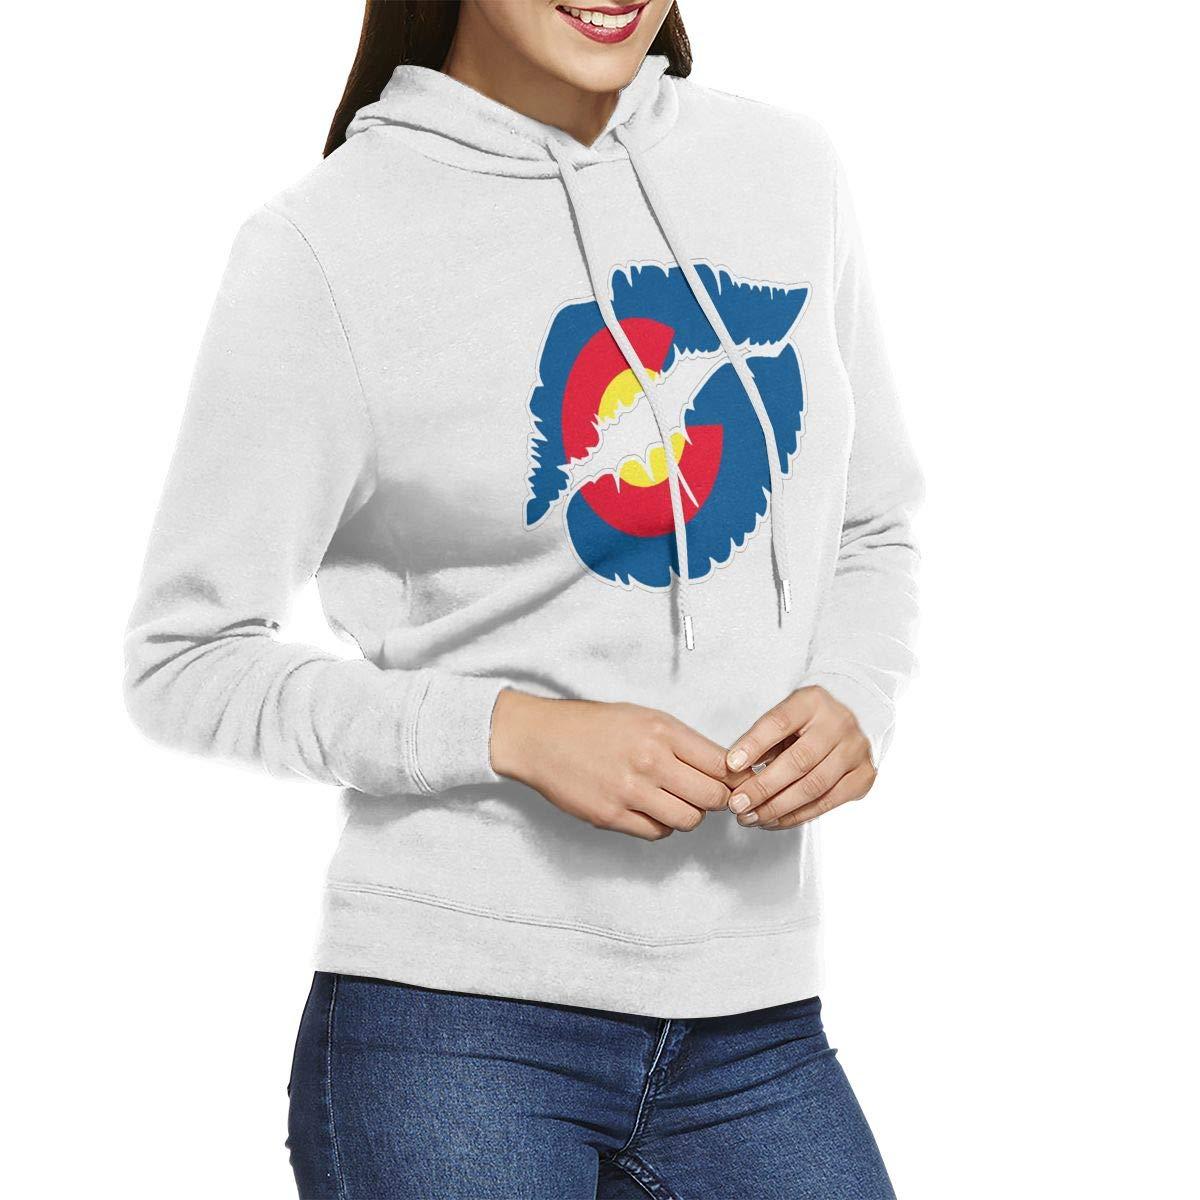 Miuins Colorado Lips Womens Hoodie Pullovers